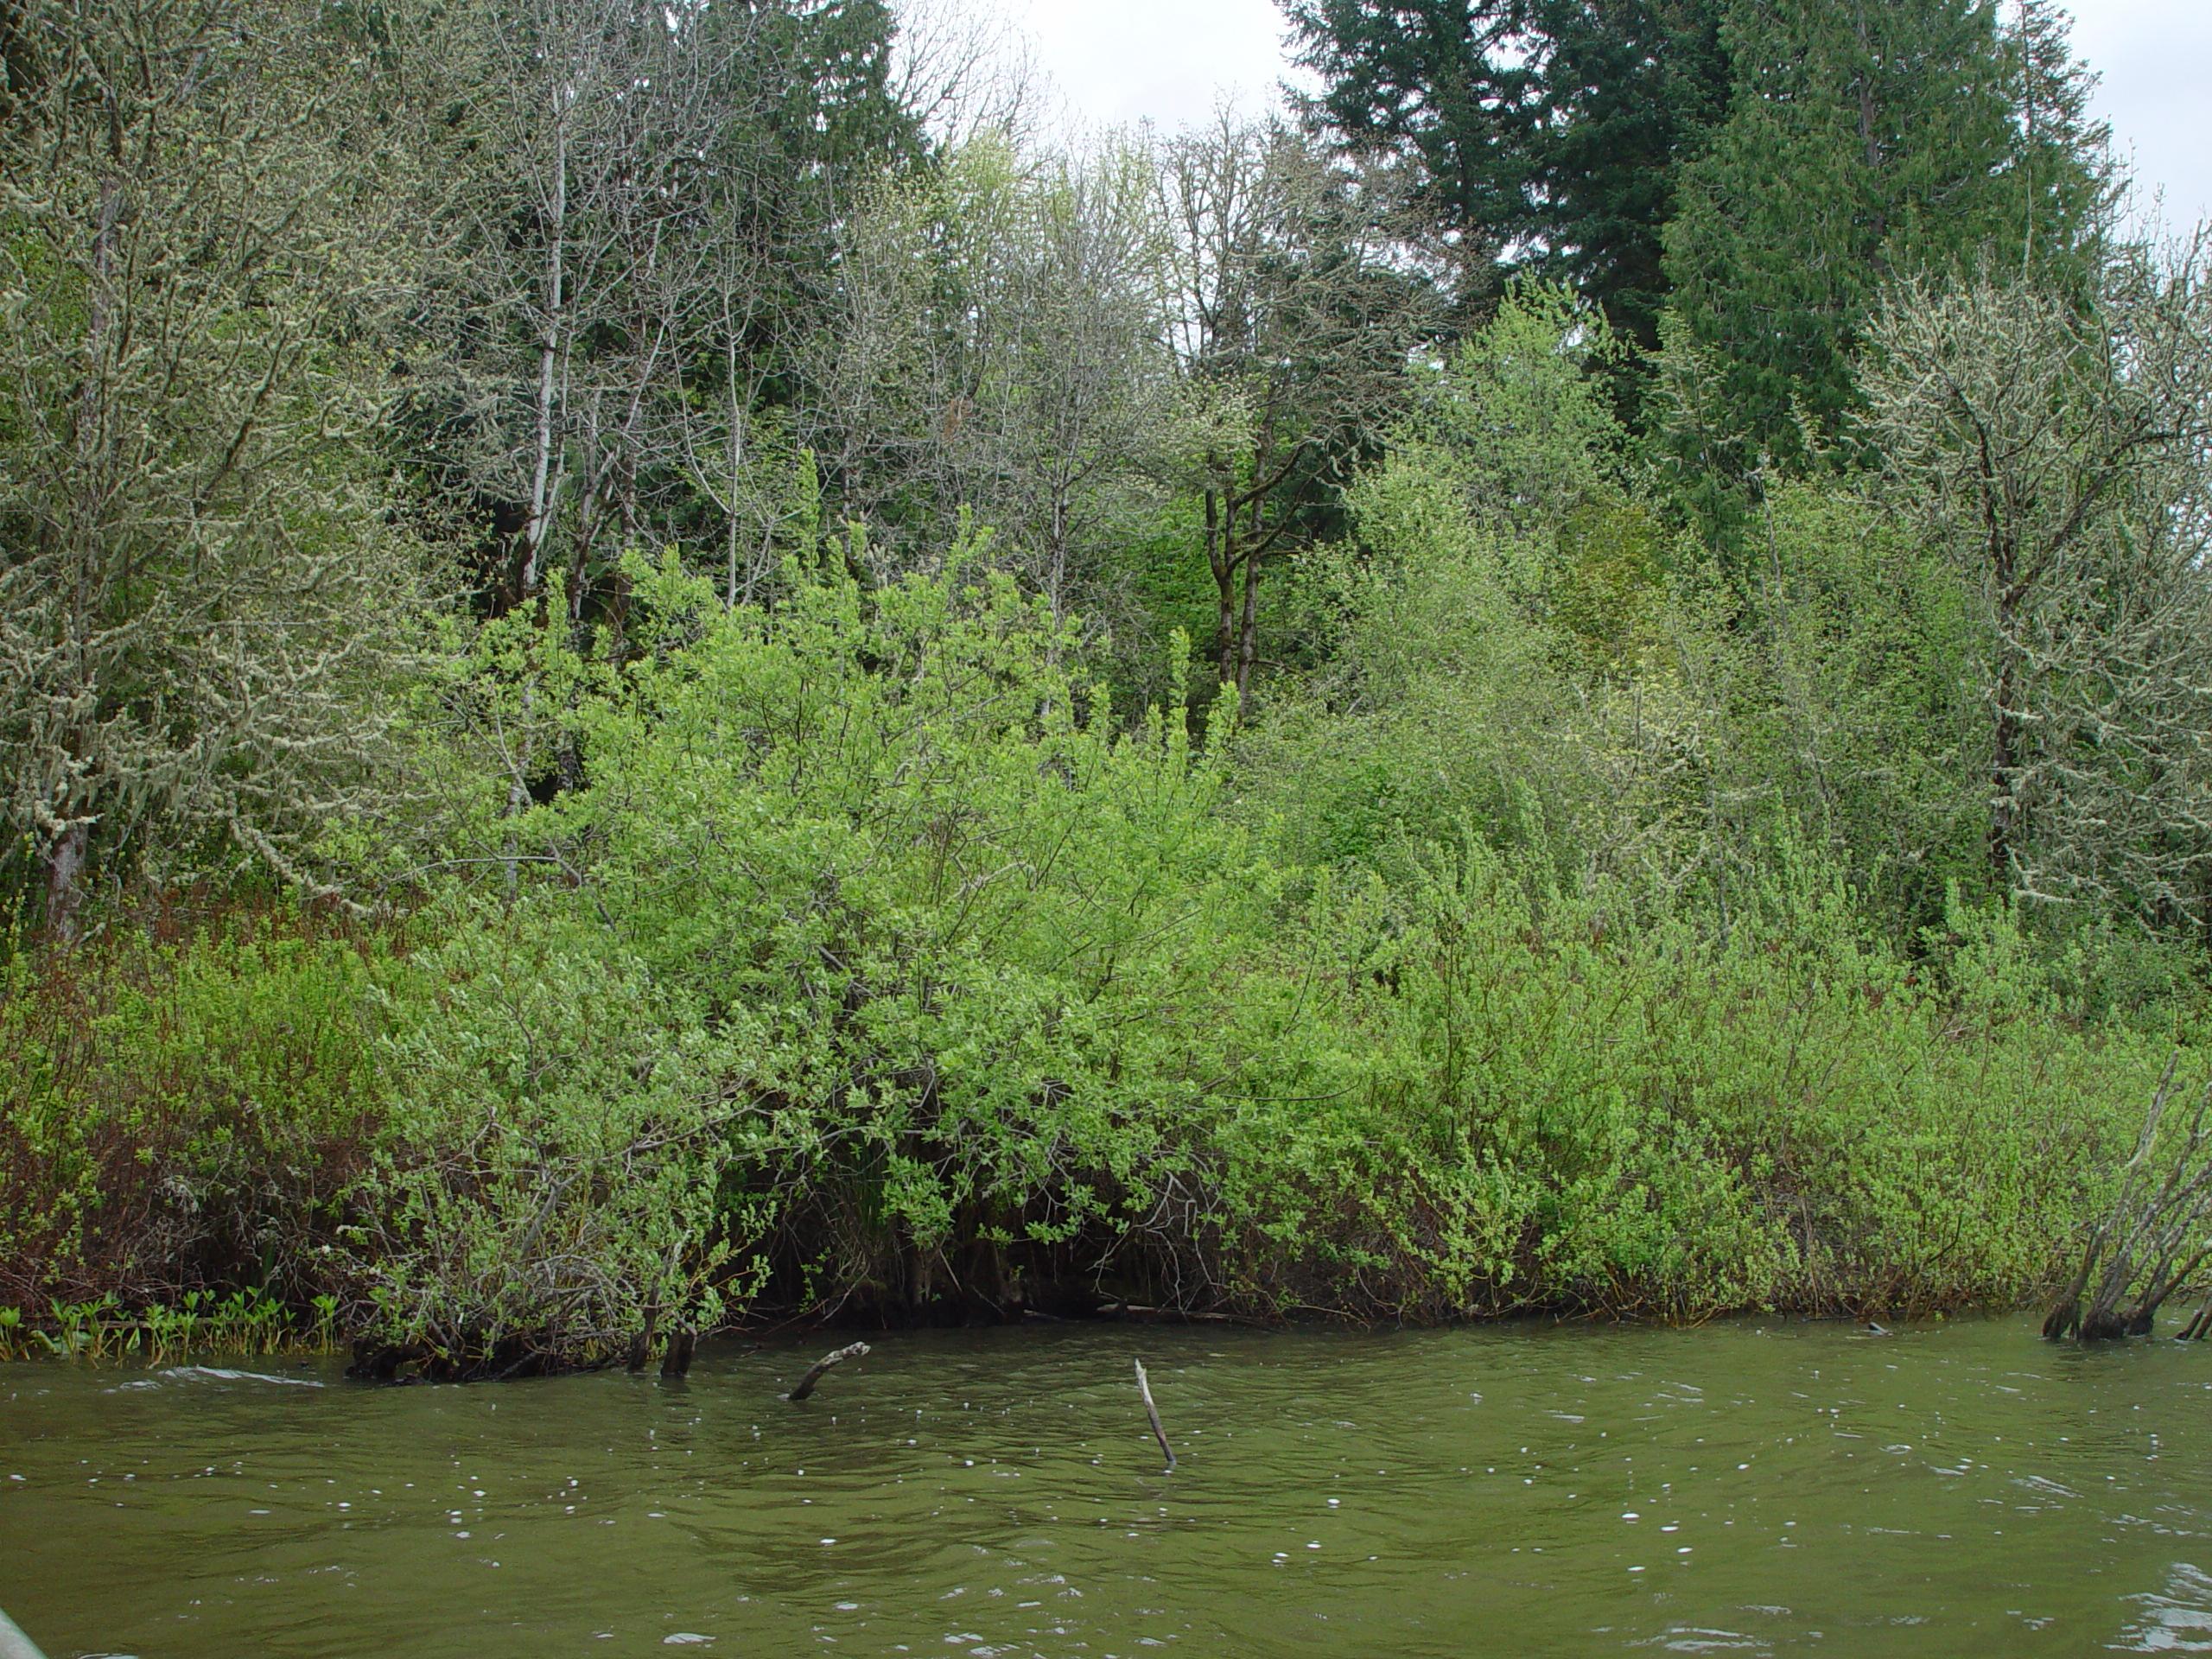 Salix geyeriana